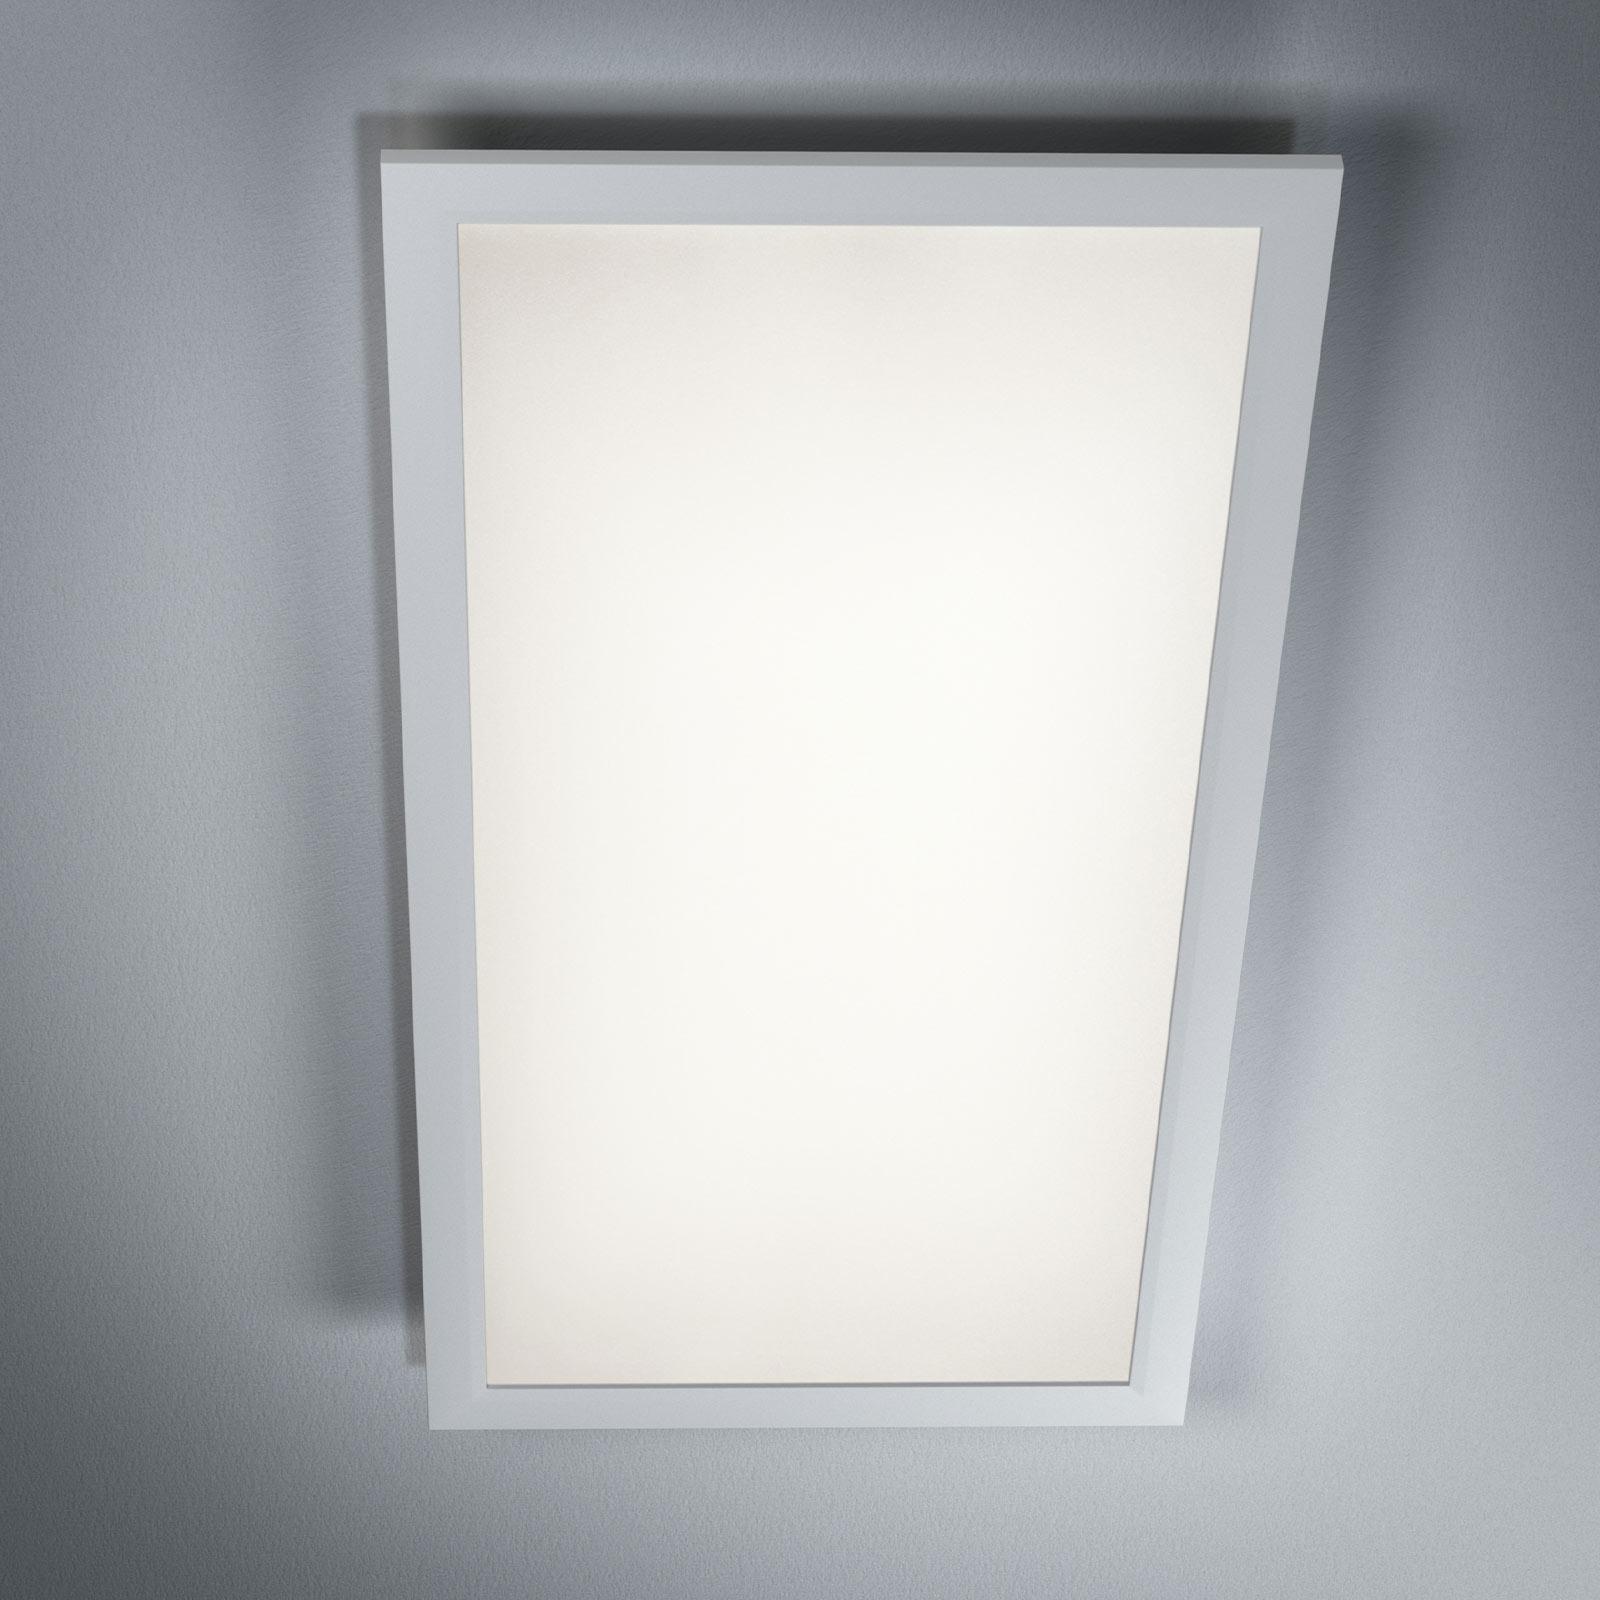 LEDVANCE Planon Plus LED-panel 60x30cm 830 15W